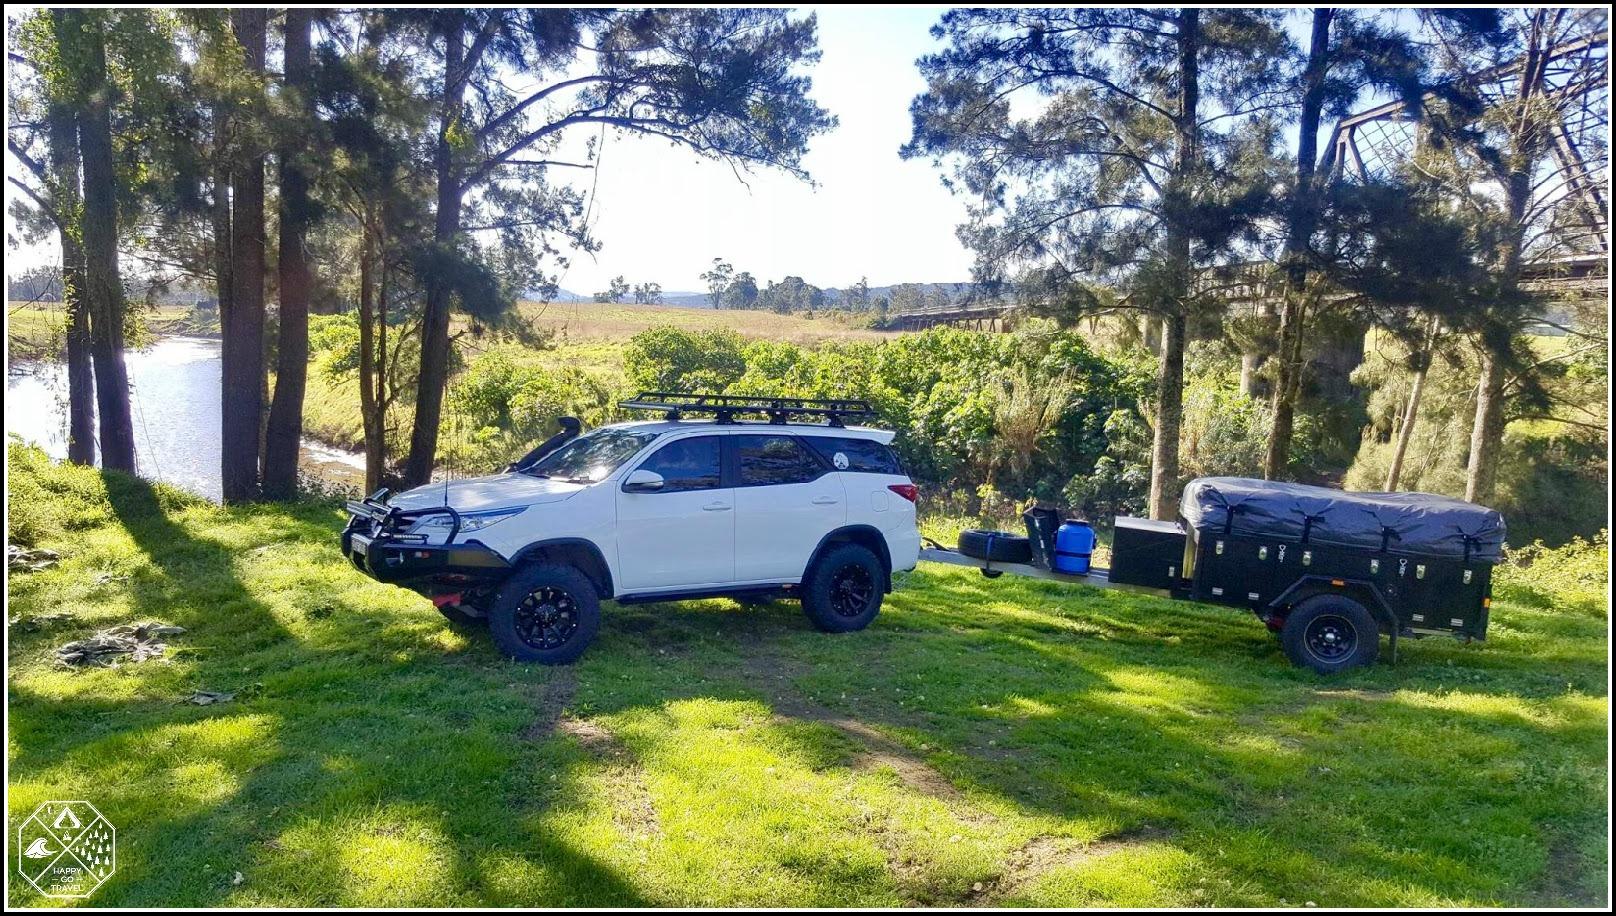 Toyota Fortuner - Towing a Black Series Alpha Camper Trailer